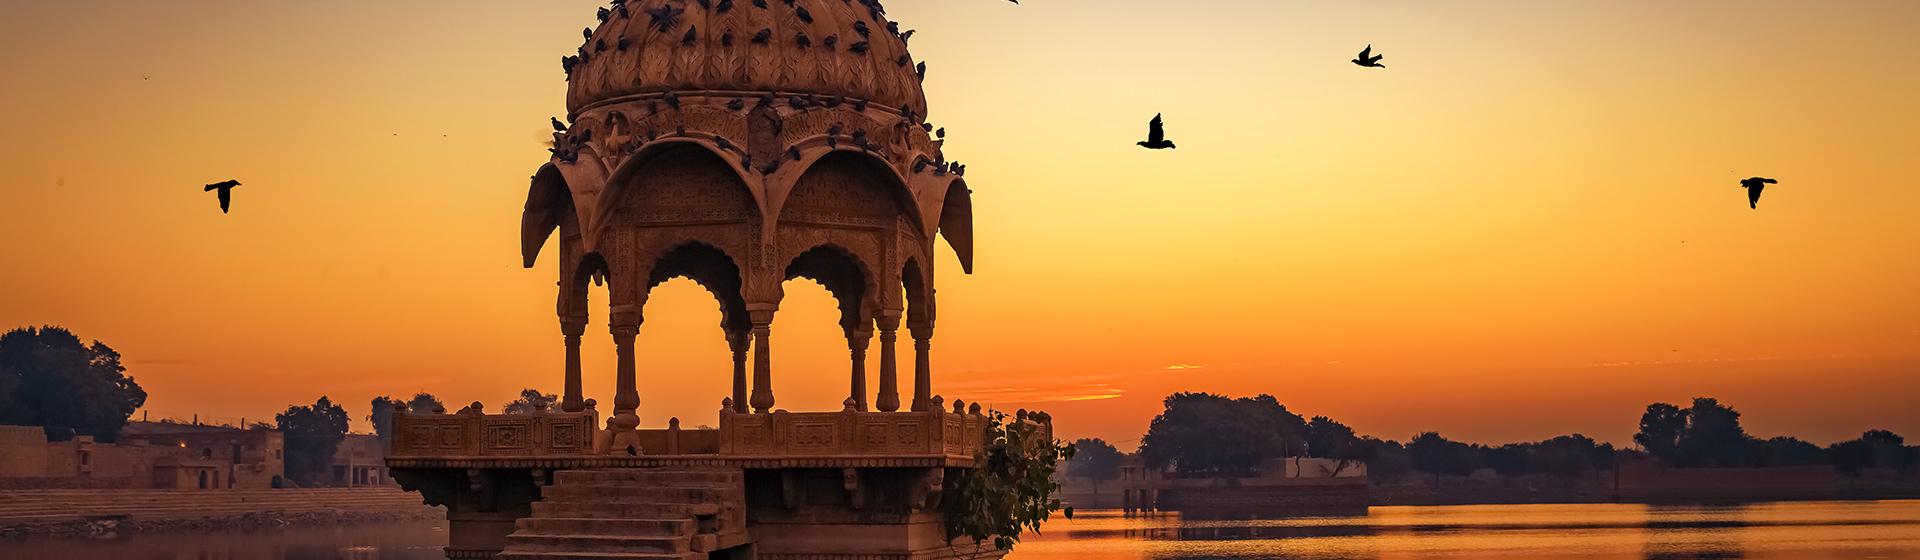 Rajasthan Clásico